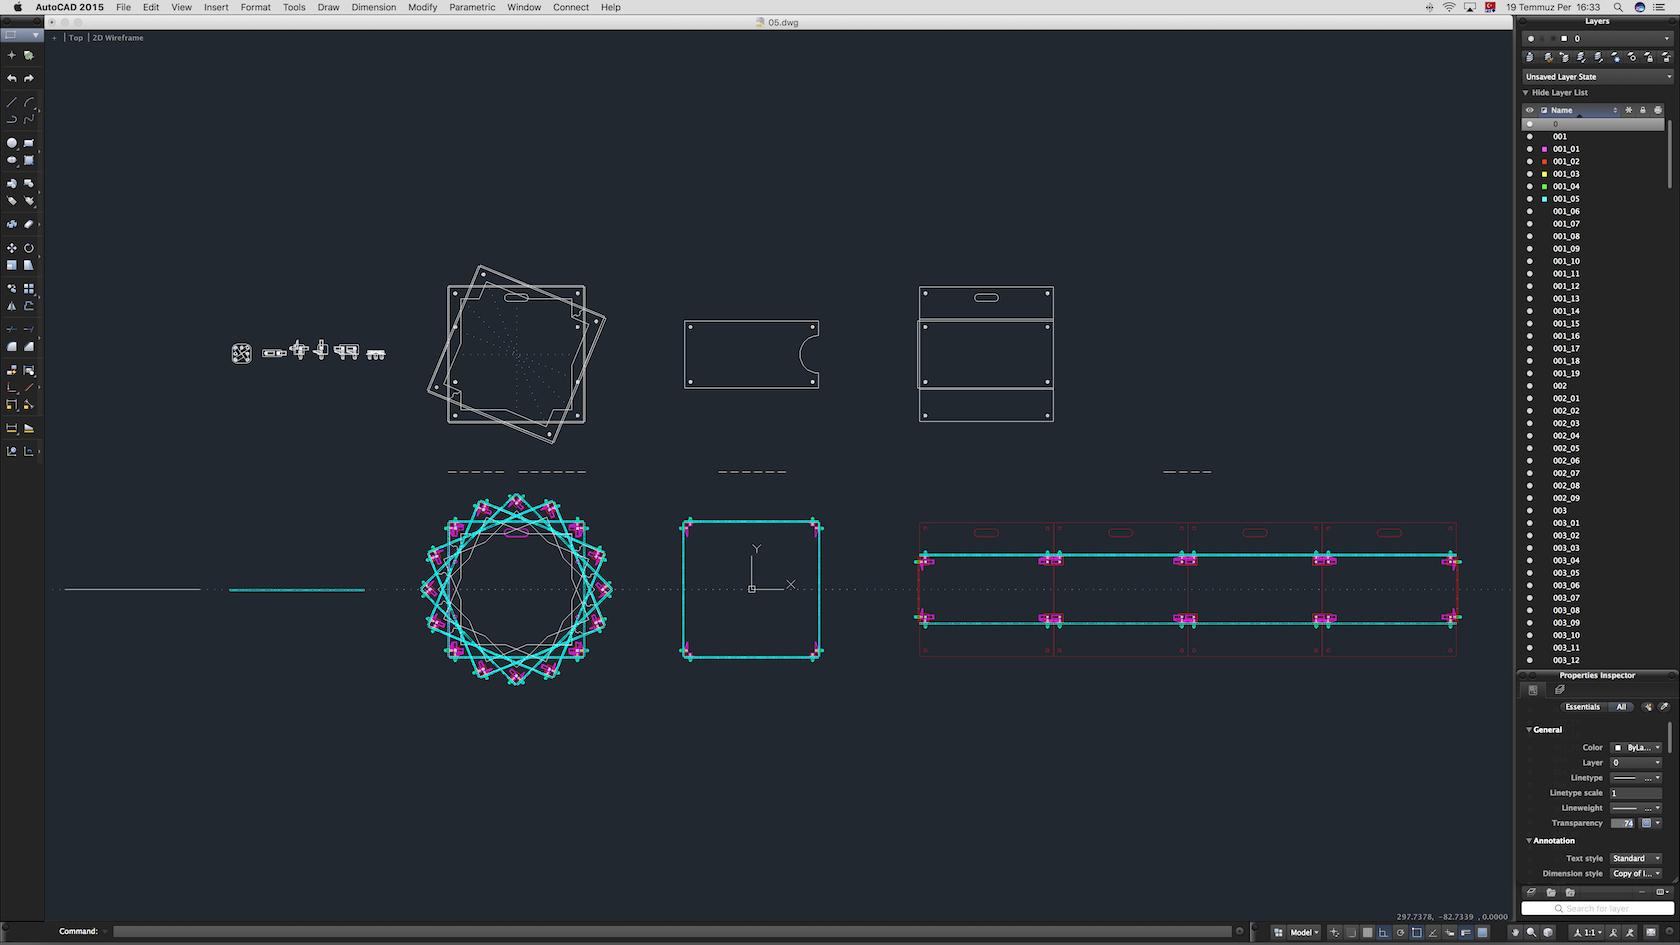 70-Cad-05-02-1680.jpg Download STL file Stage Decor Collection 01 (Modular 9 Pieces) • 3D printer model, akerStudio